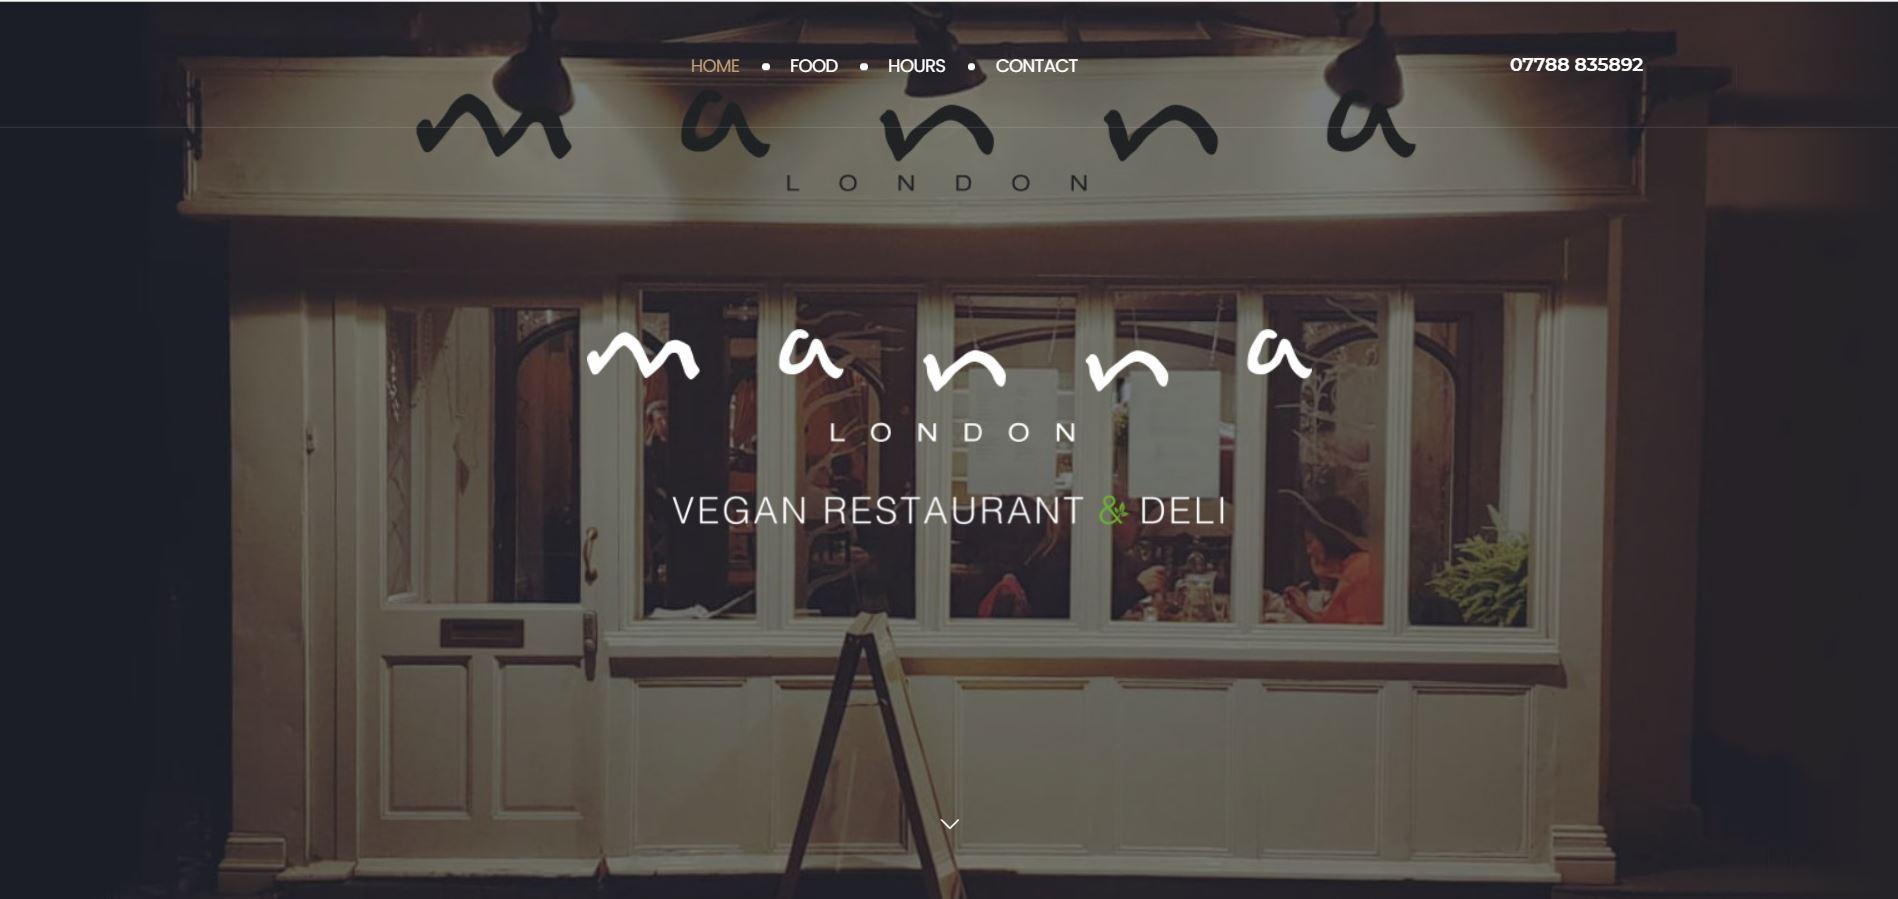 Manna London